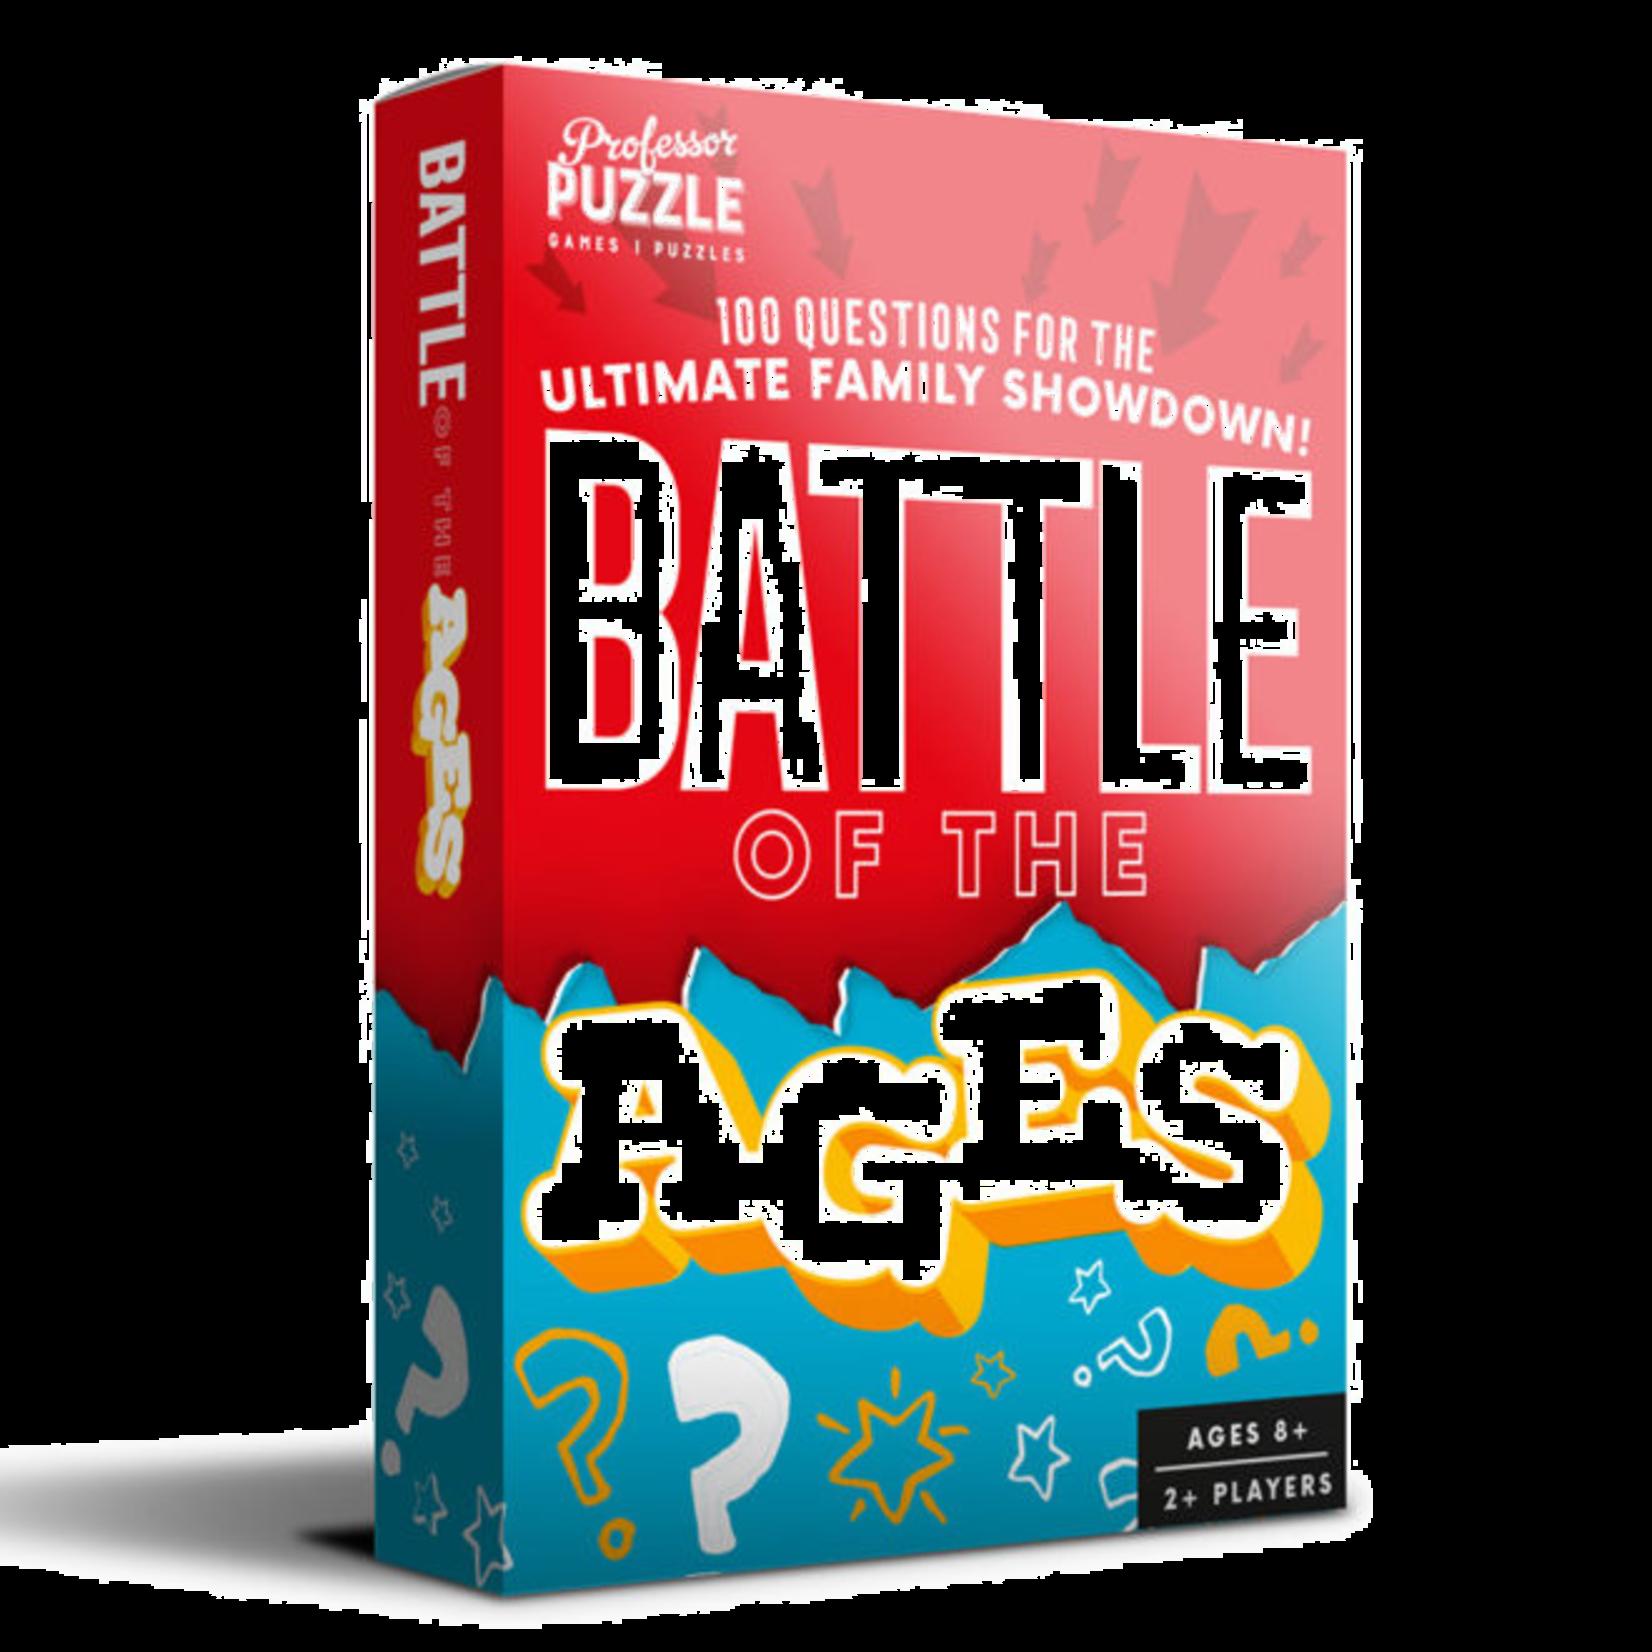 Professor Puzzle Pocket Battle of the Ages